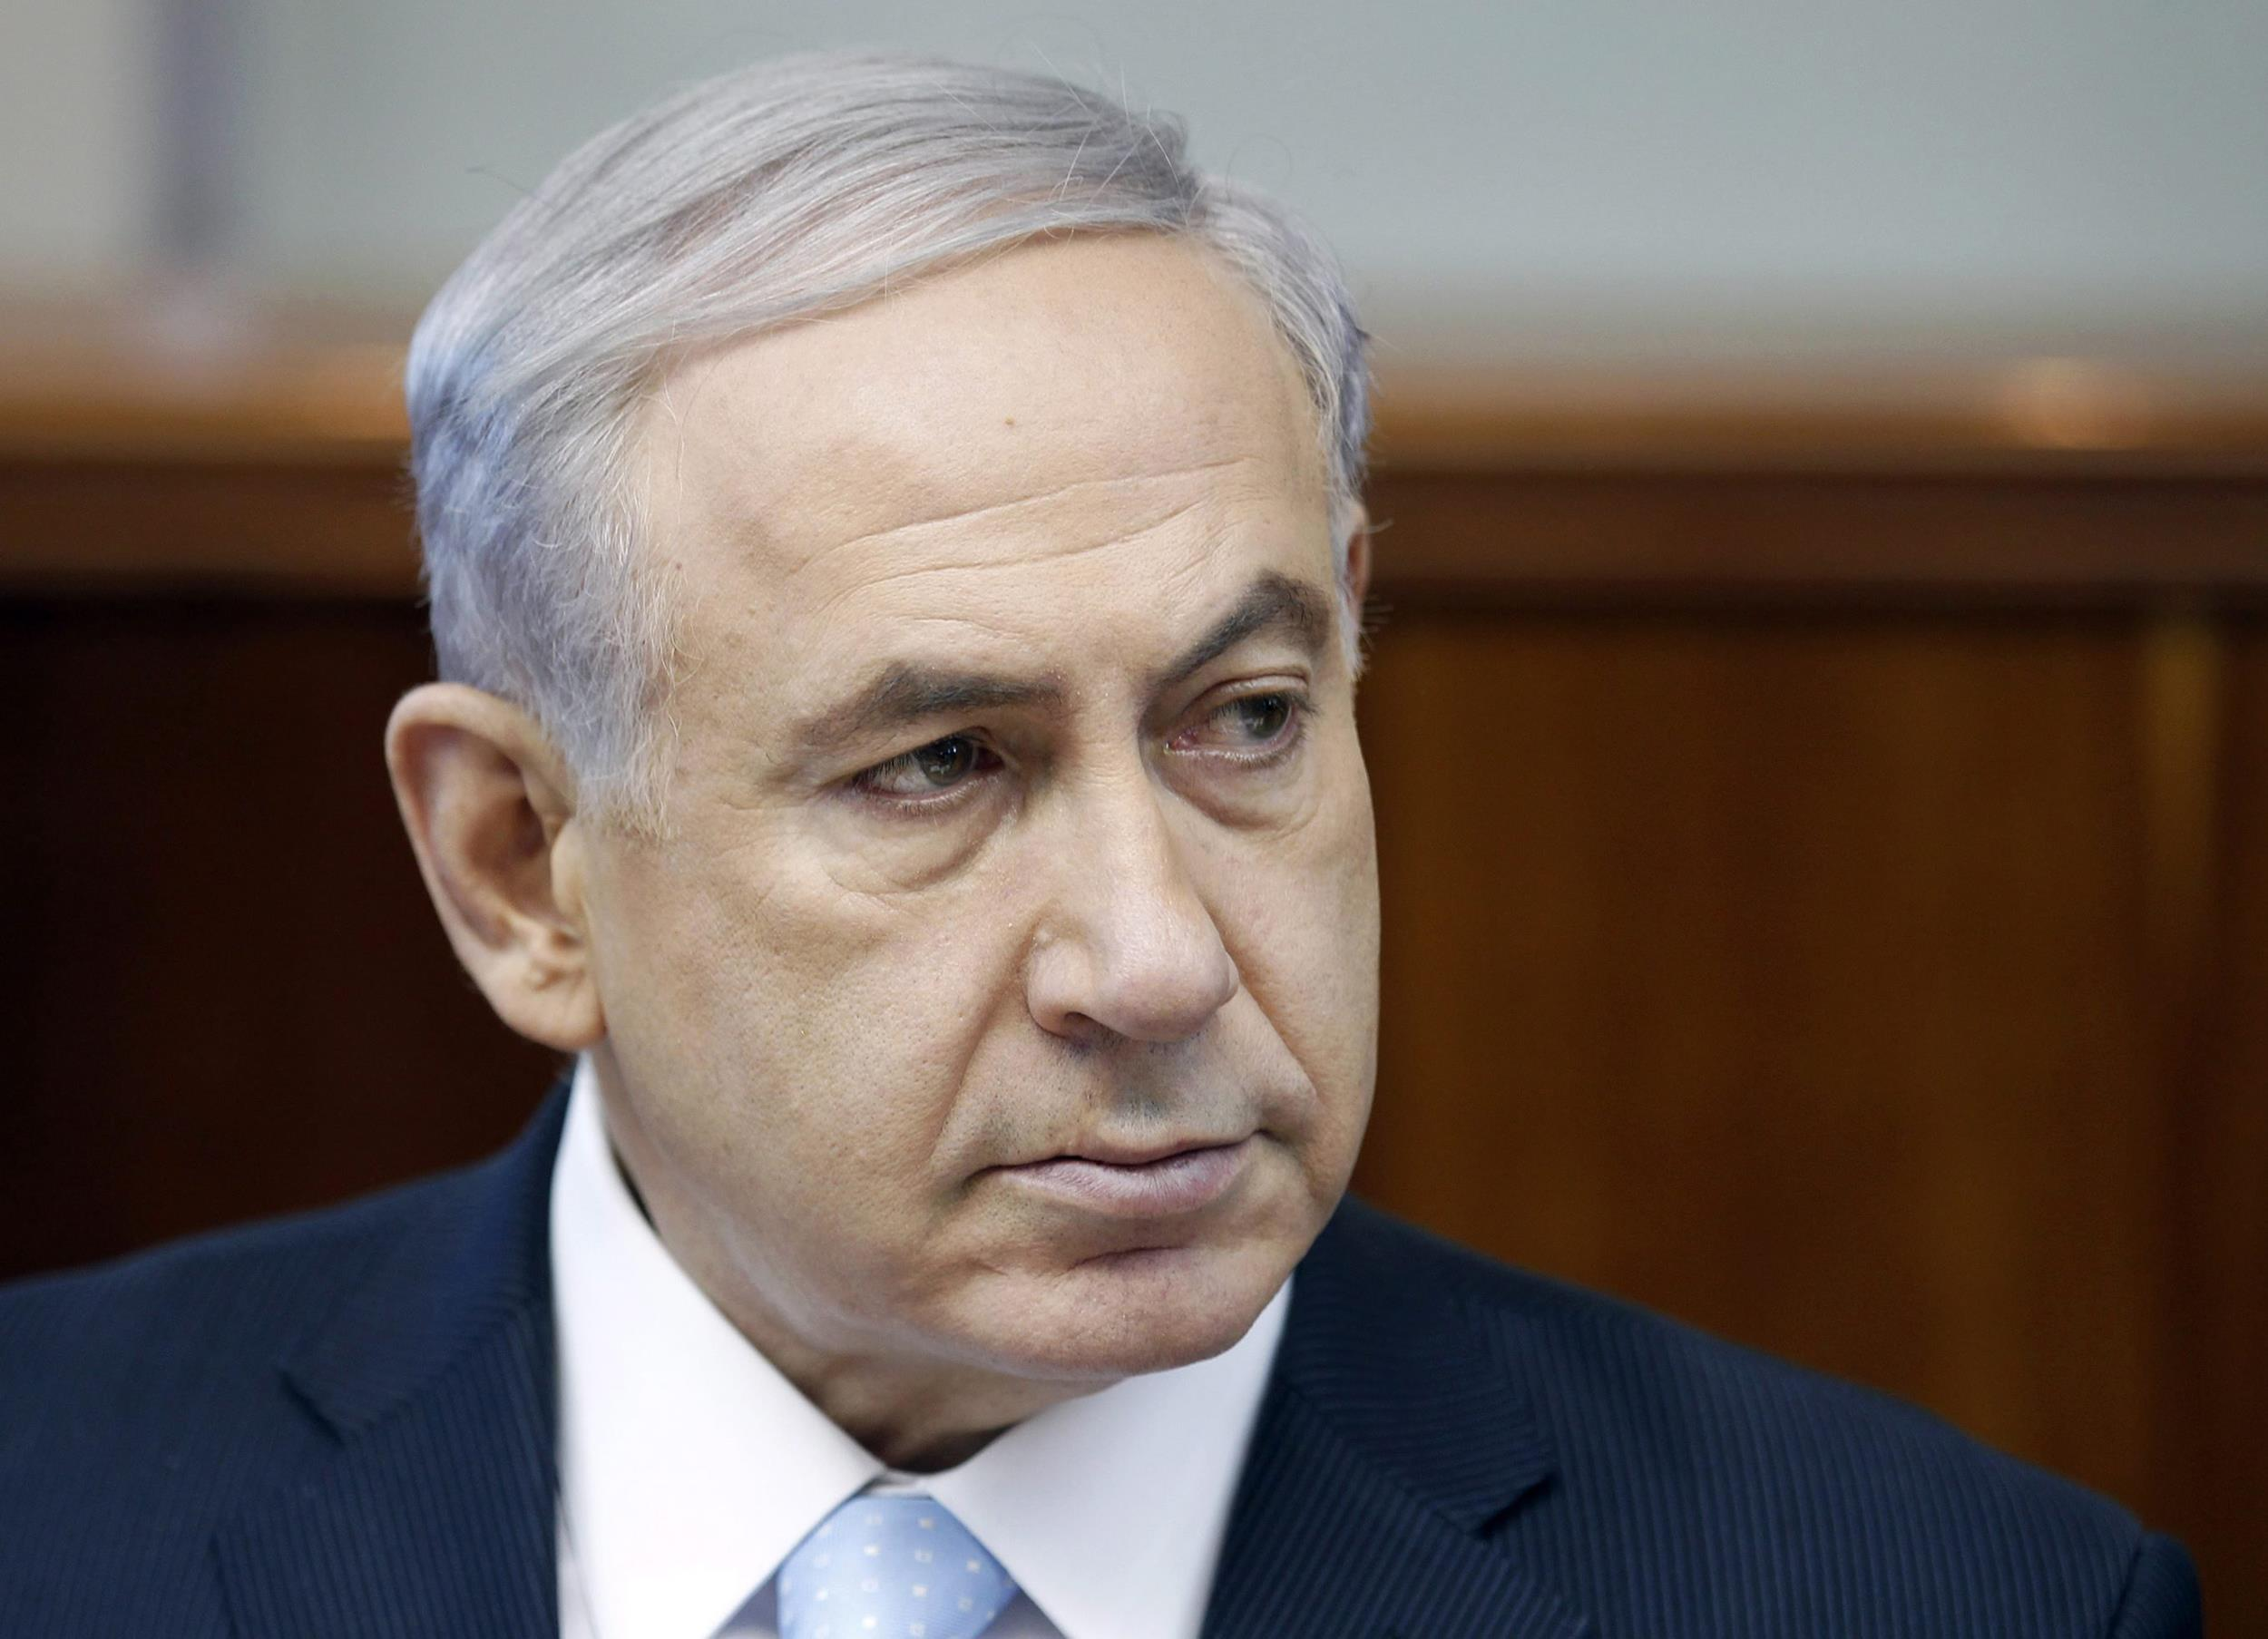 Image: Israel's Prime Minister Benjamin Netanyahu attends cabinet meeting in Jerusalem